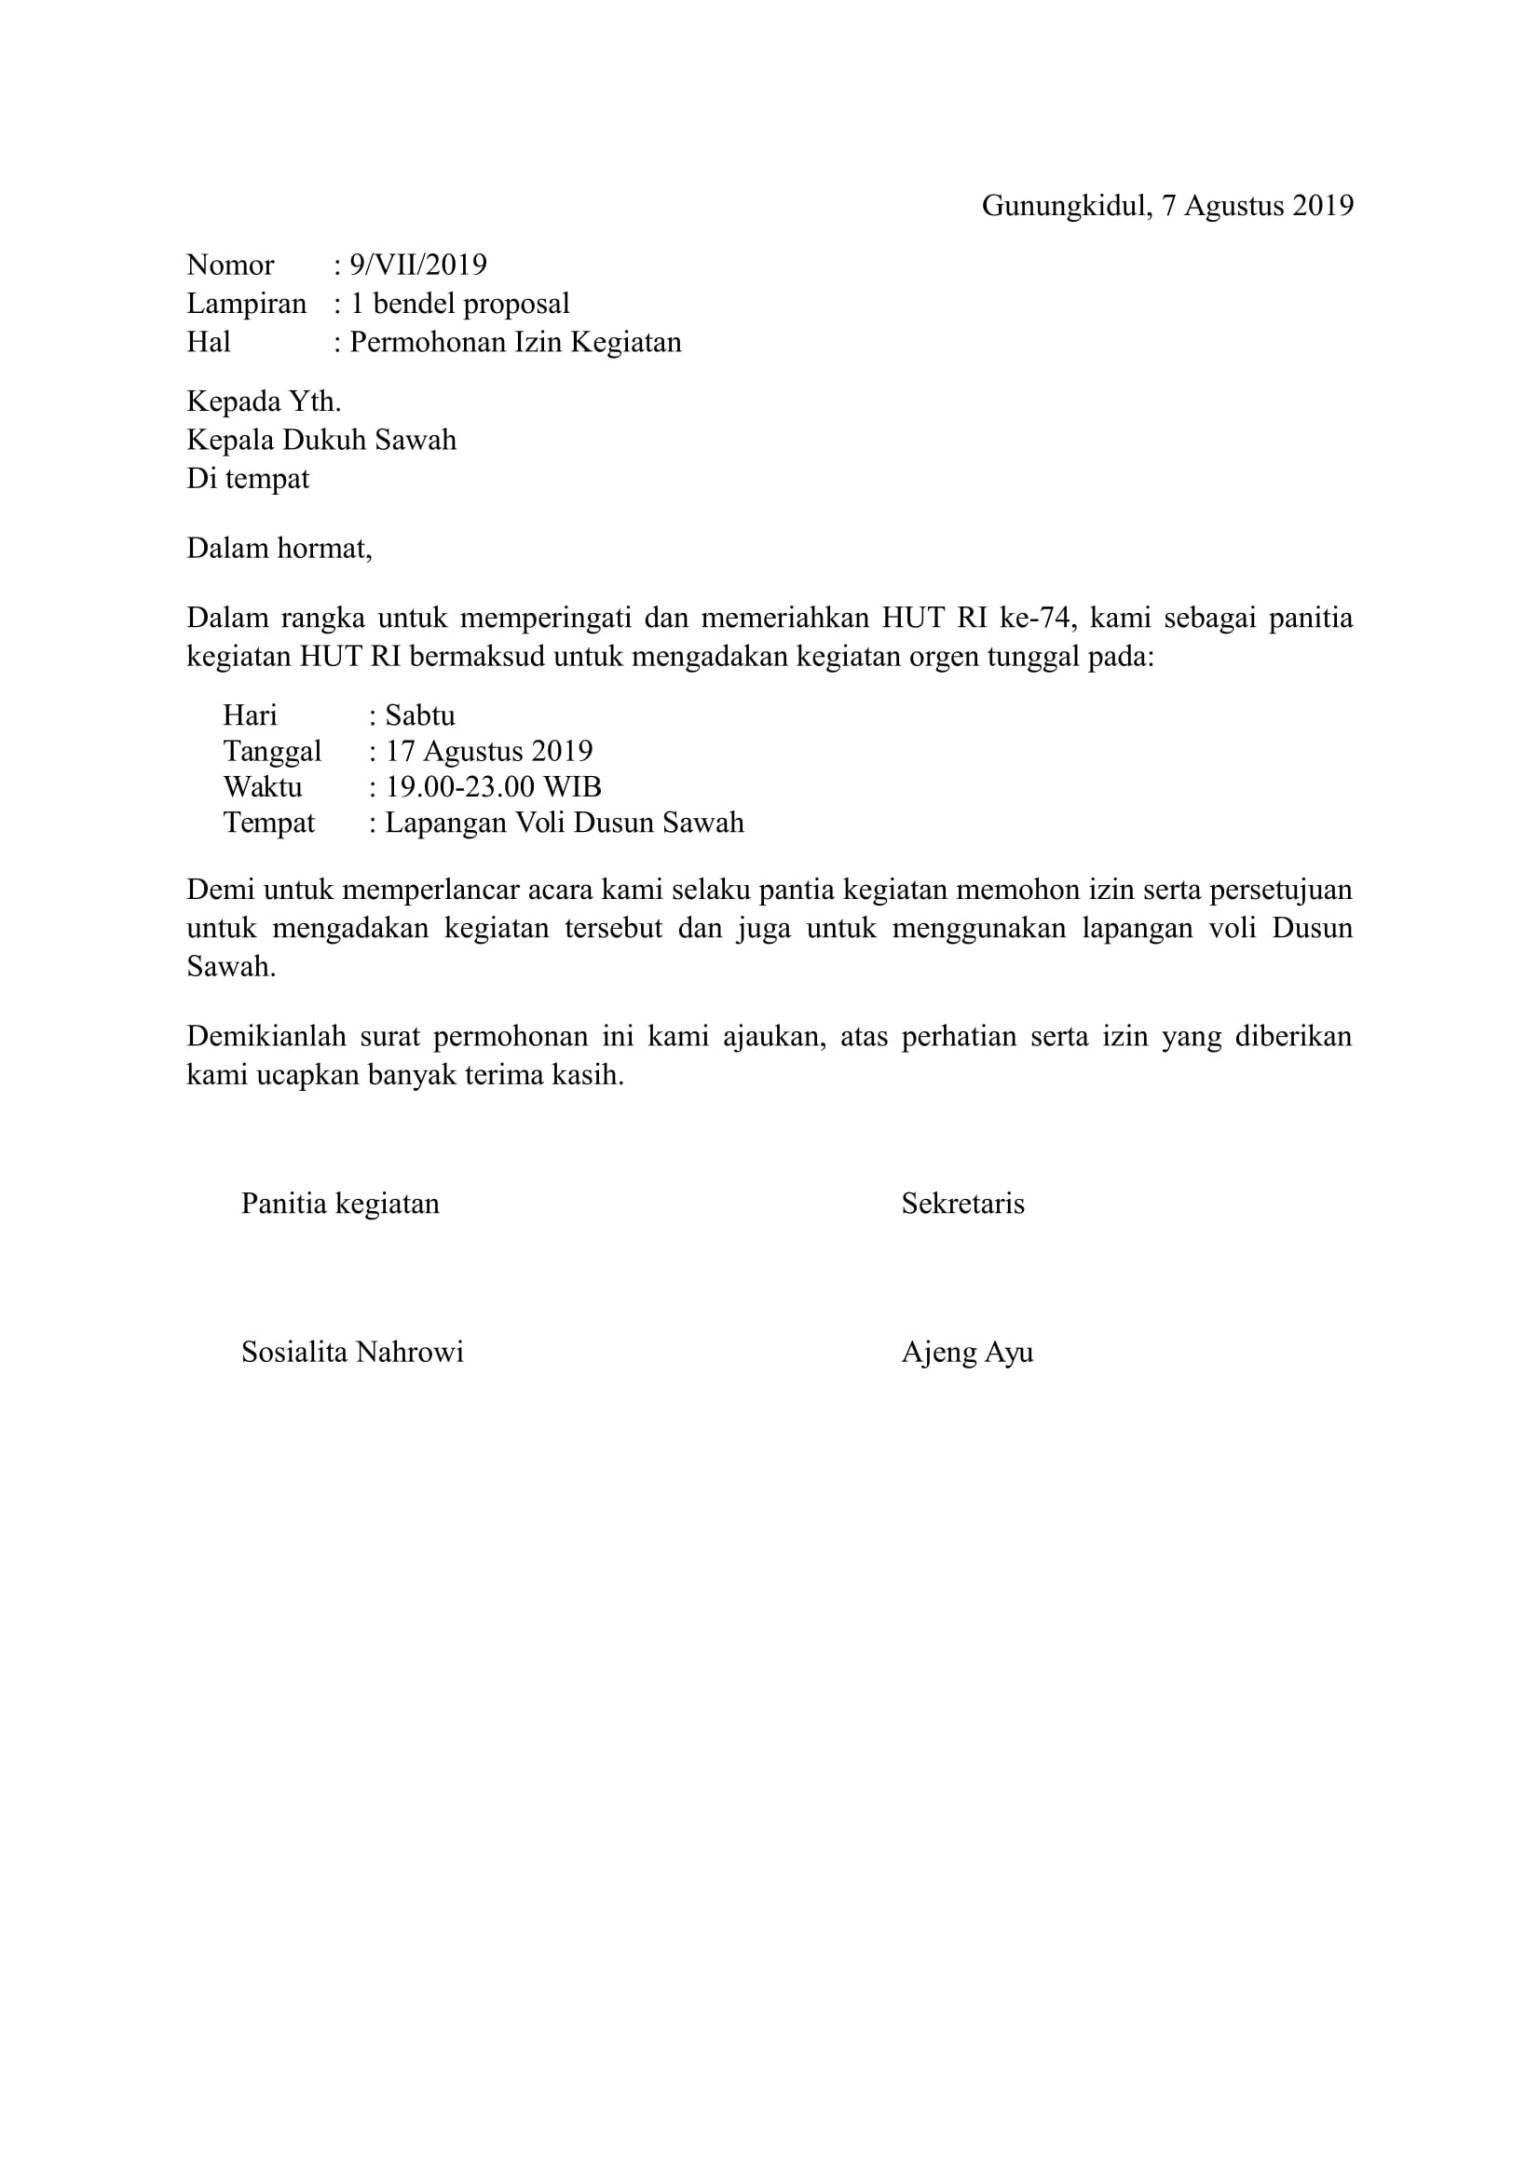 Contoh surat izin Surat Proposal Tanggal